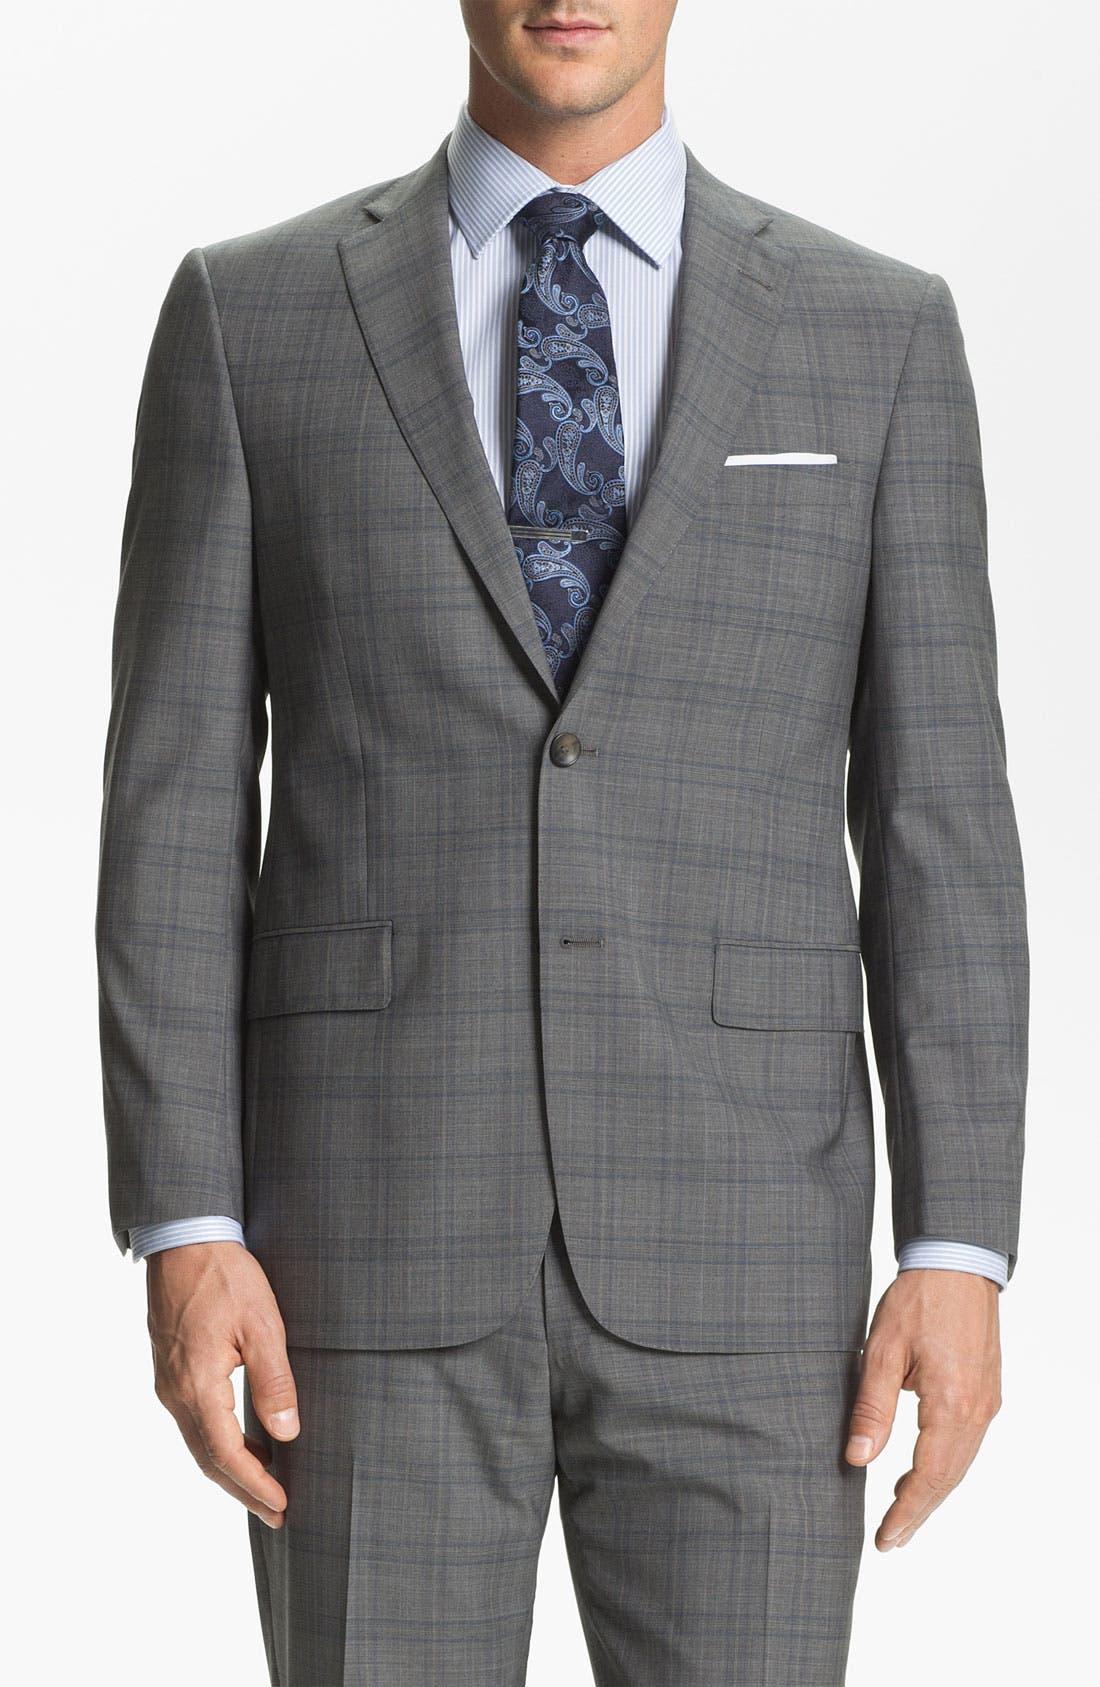 Alternate Image 1 Selected - Hart Schaffner Marx Plaid Wool Suit